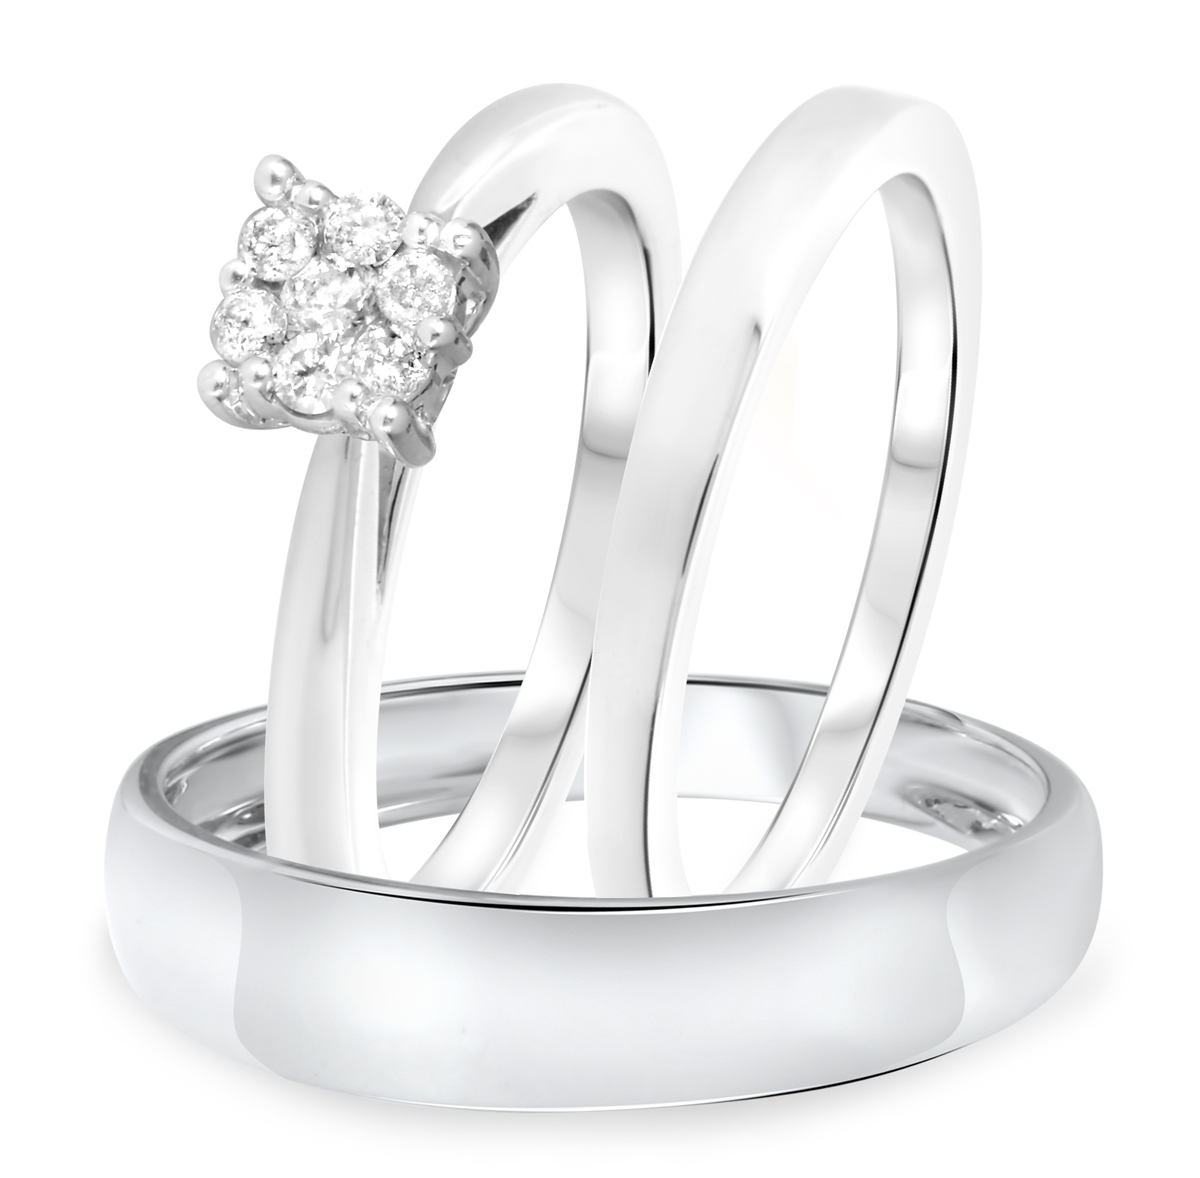 1/5 CT. T.W. Diamond Ladies Engagement Ring, Wedding Band, Men's Wedding Band